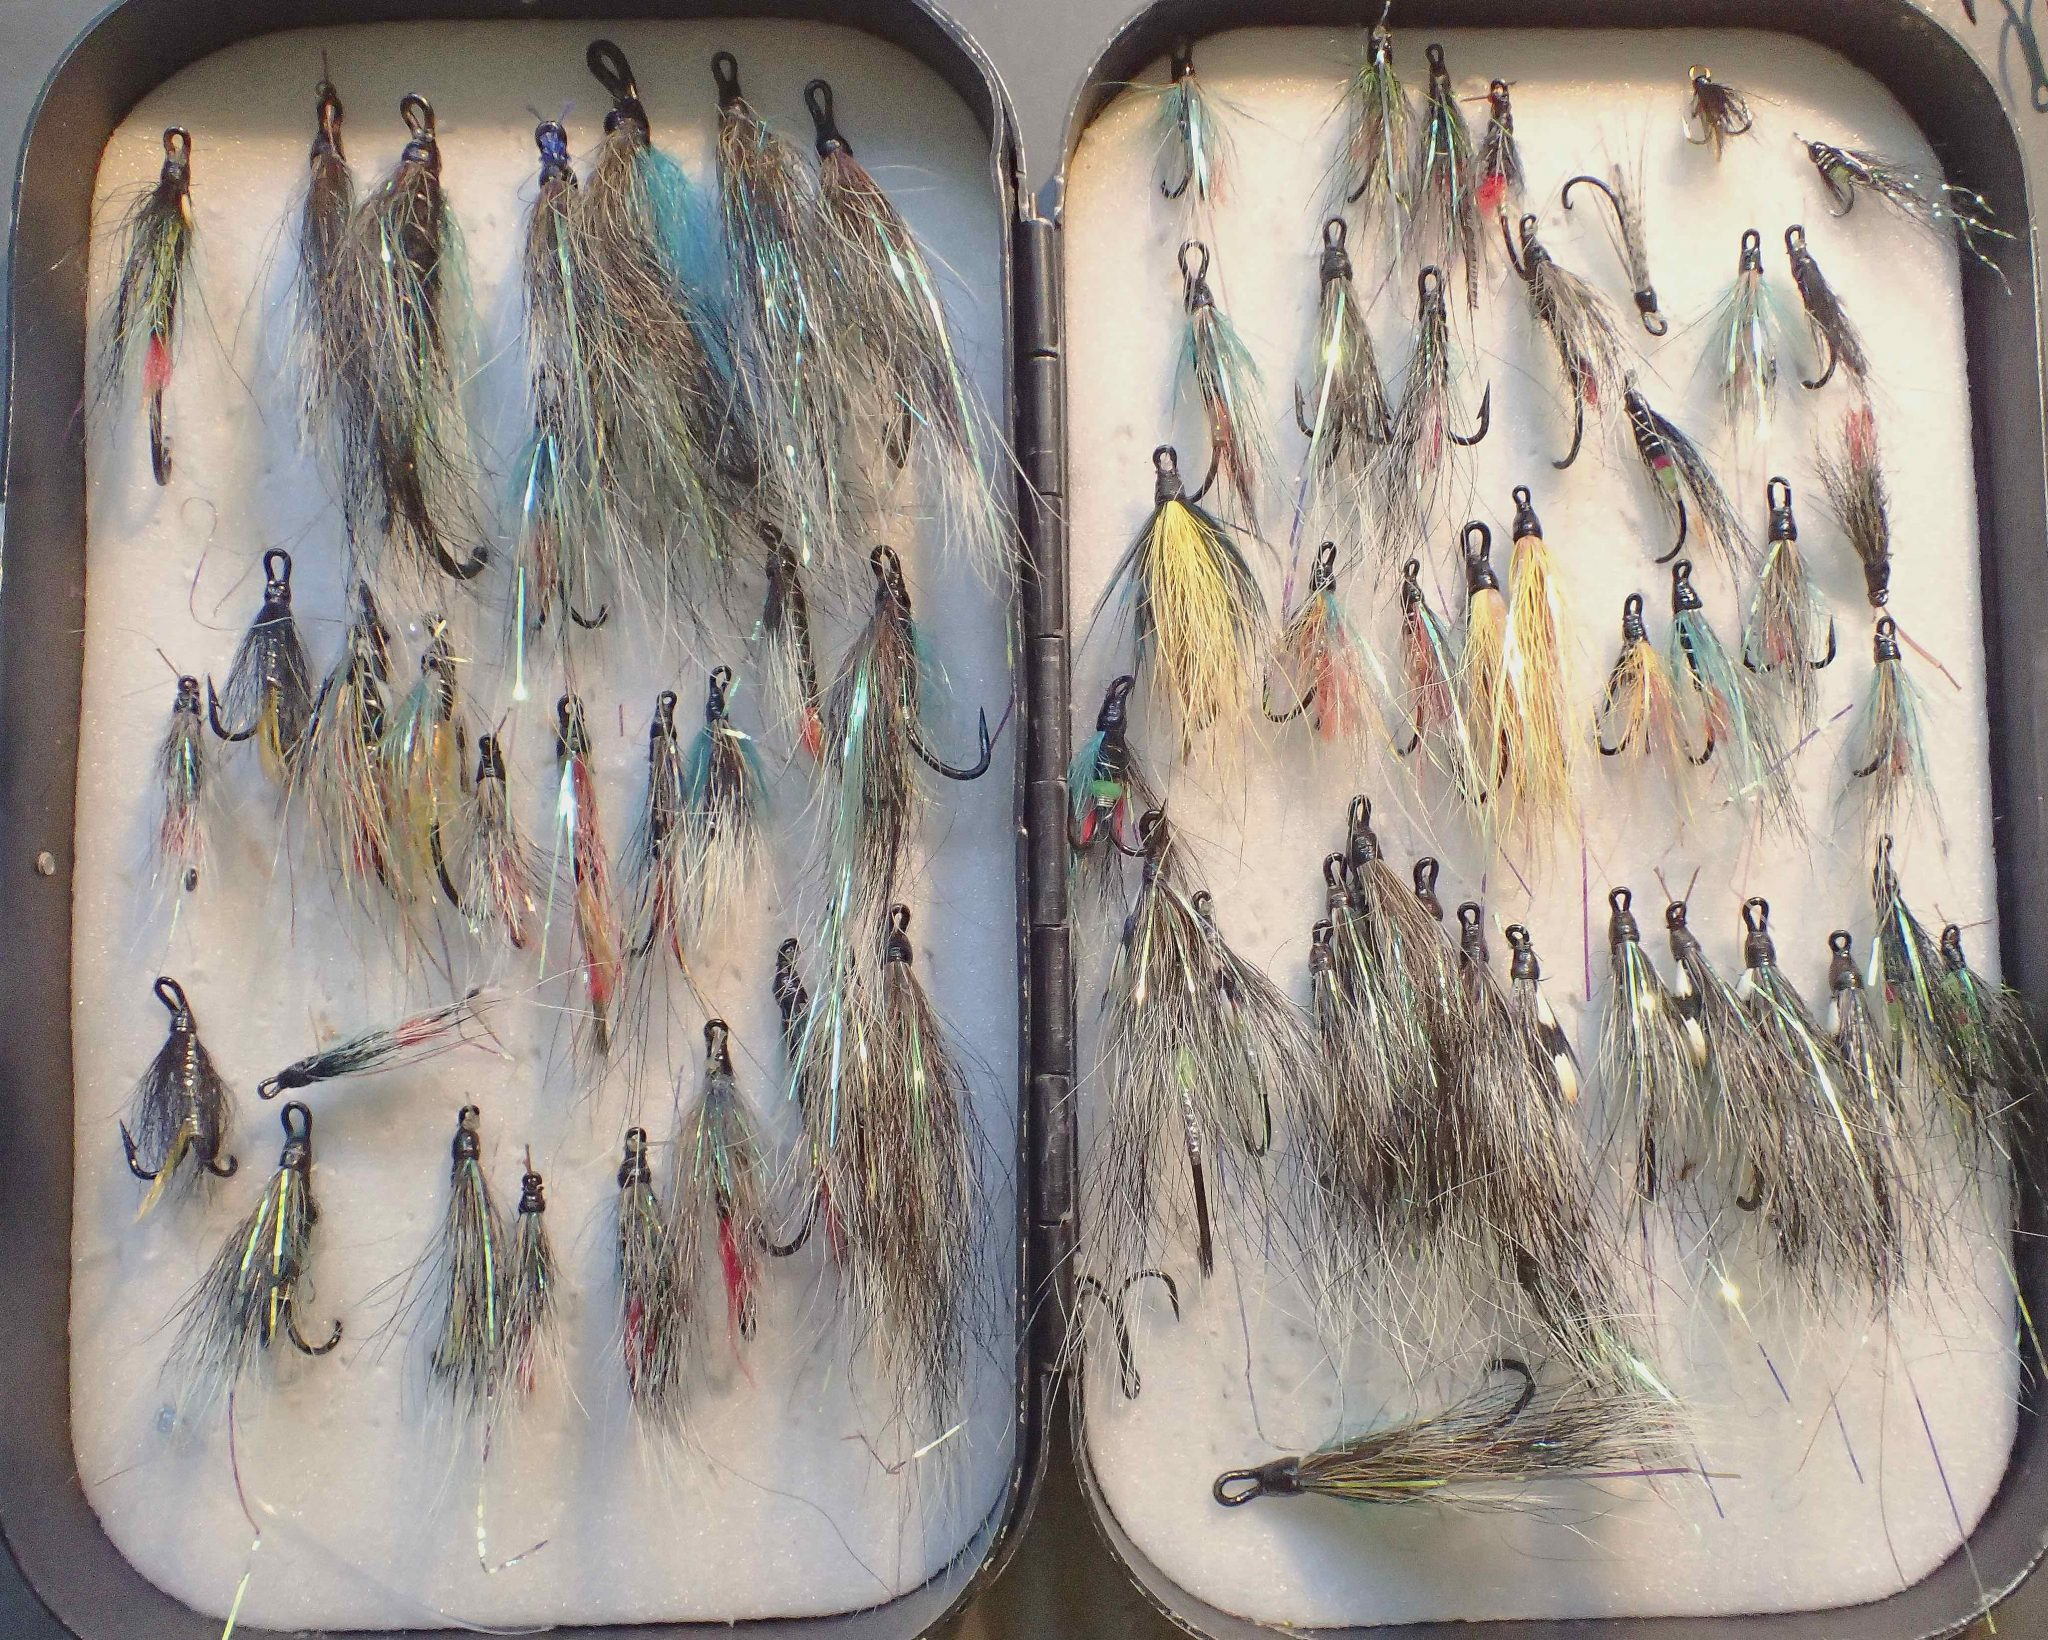 Blue Charm Salmon Fly